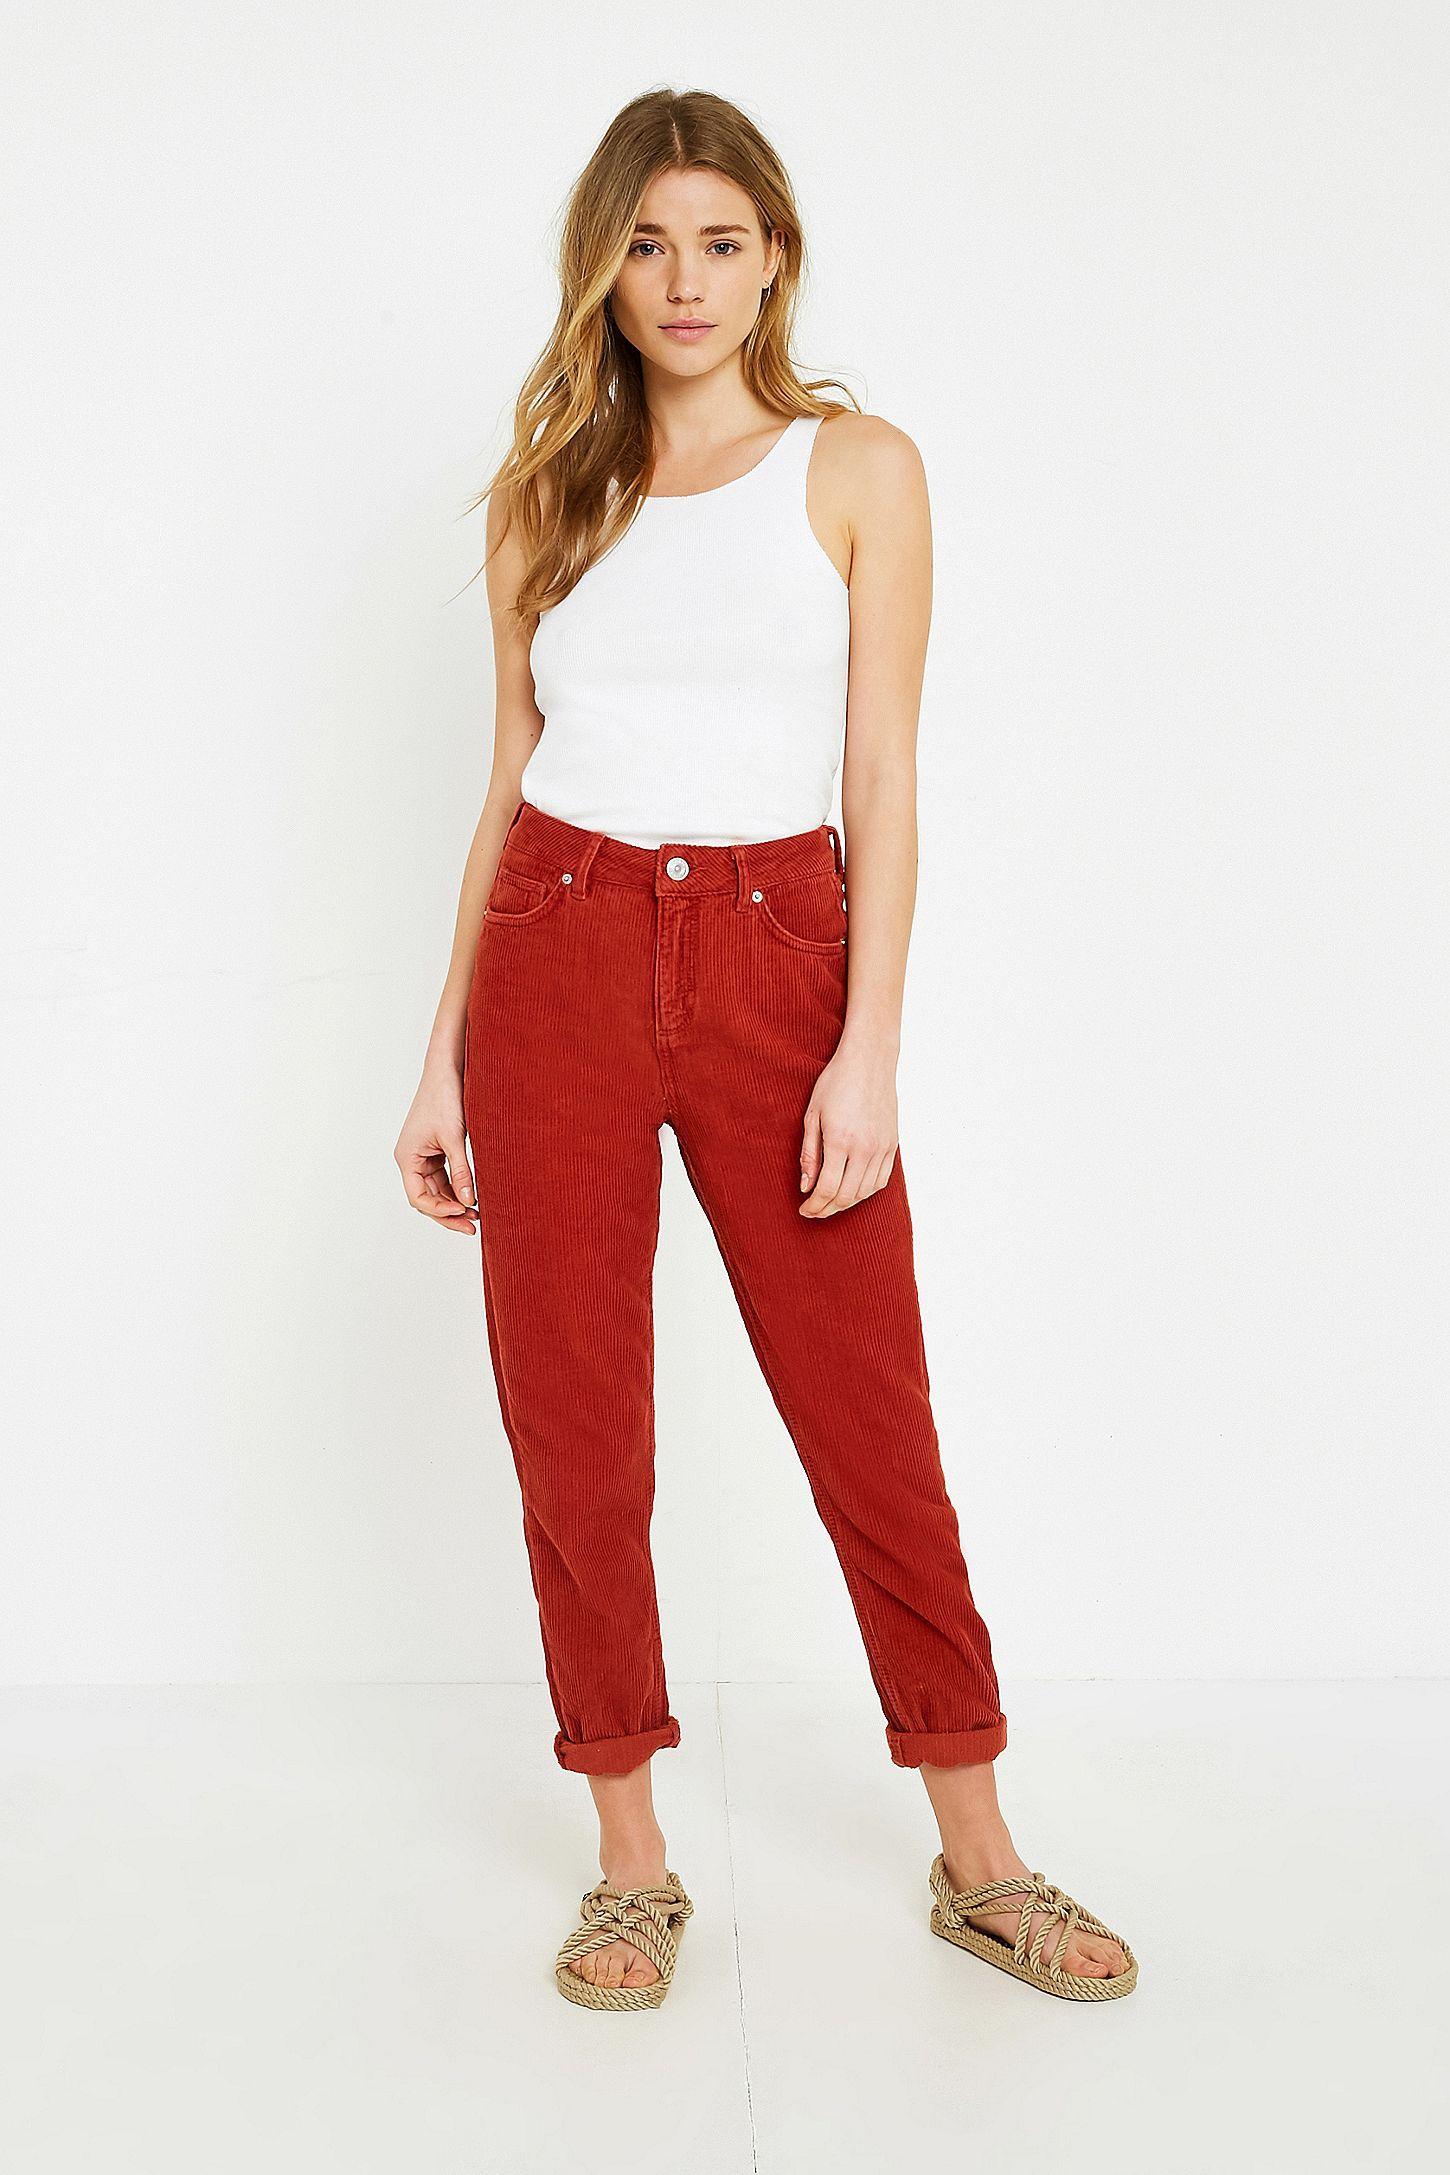 BDG Oxblood Red Mom Jeans   Clothing   Jeans, Mom jeans, Bdg jeans e3deb0baf2